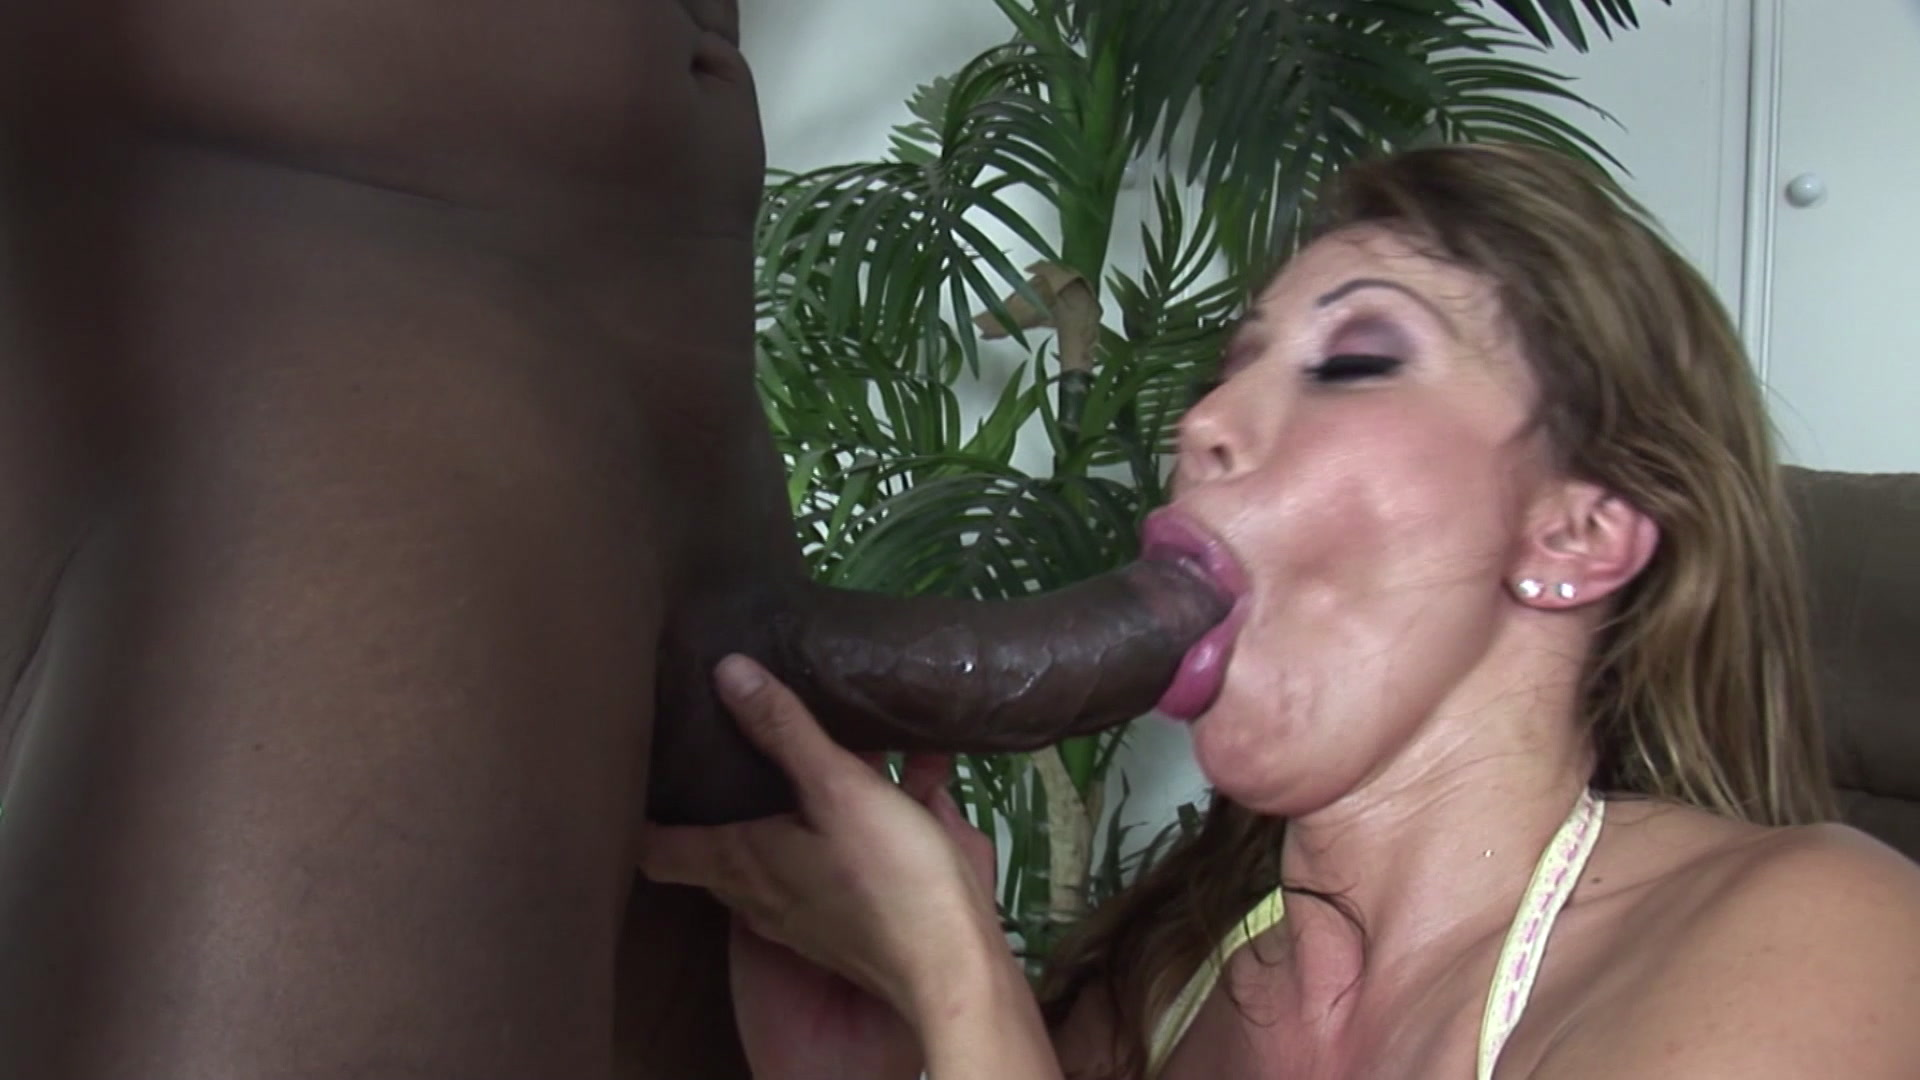 Ava devine sucking dick girl masturbated asian